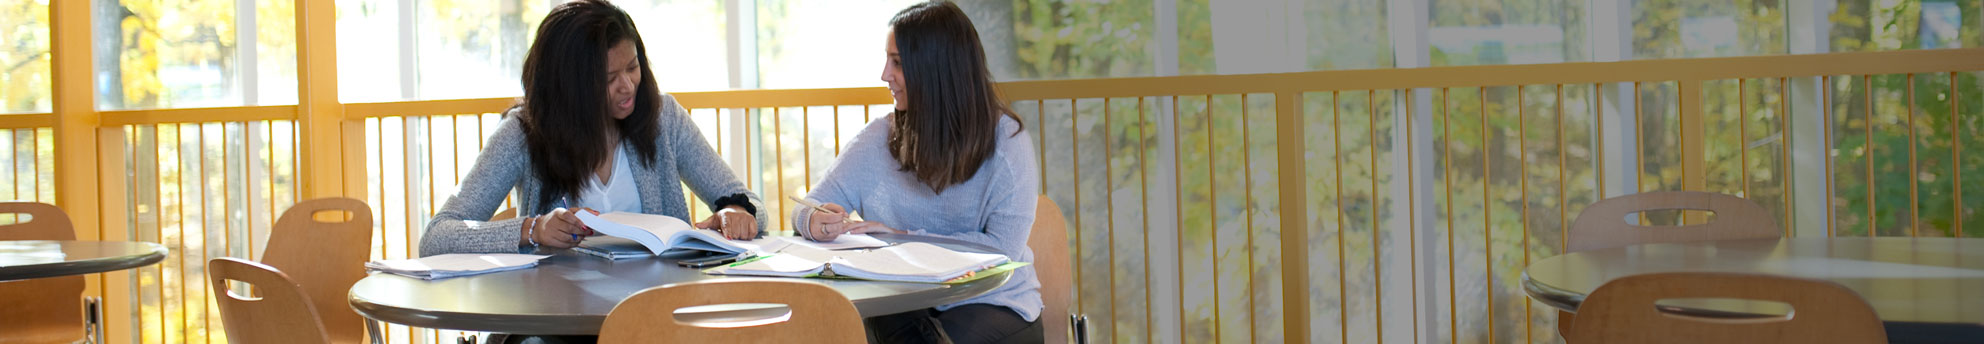 Master's Degrees | Programs | HEC Montréal